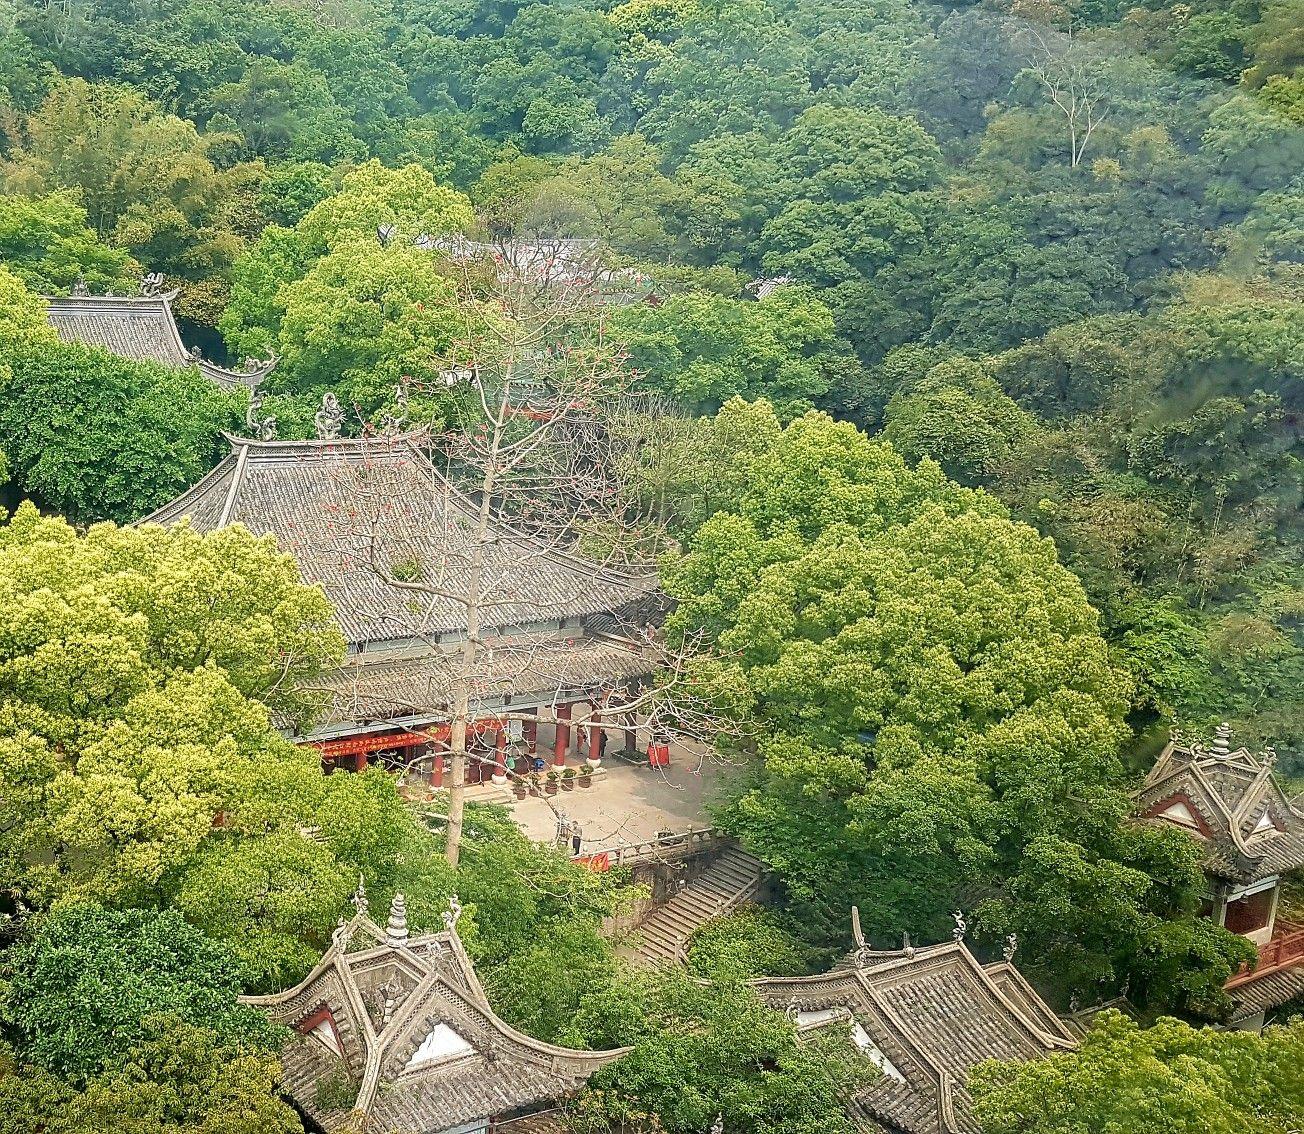 baiyun mountain guangzhou outdoor baiyun river on extraordinary garden path and walkway design ideas and remodel two main keys id=70054